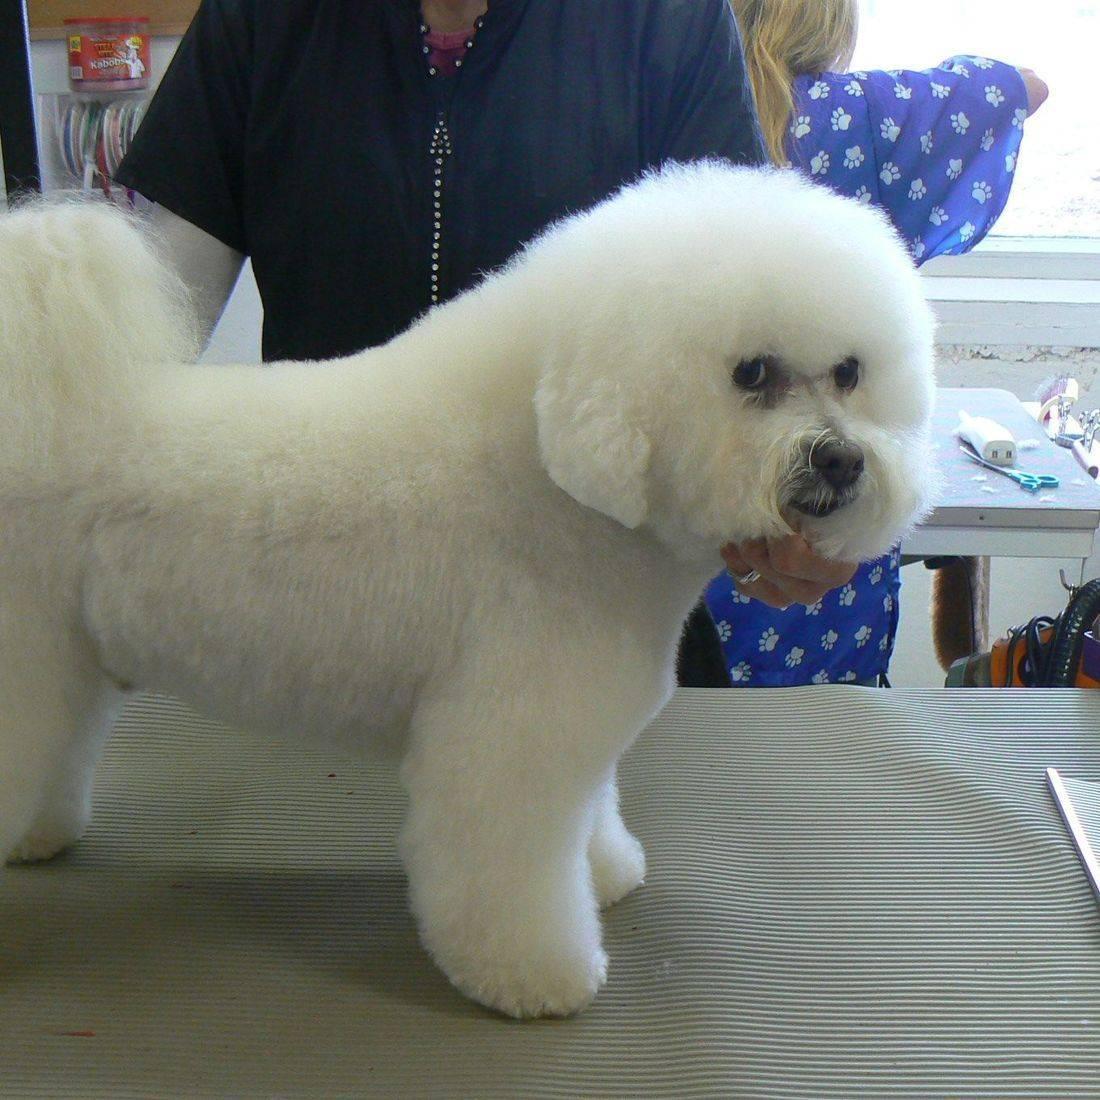 dog grooming appleton details Kimberly Wi Details pet groomer appleton